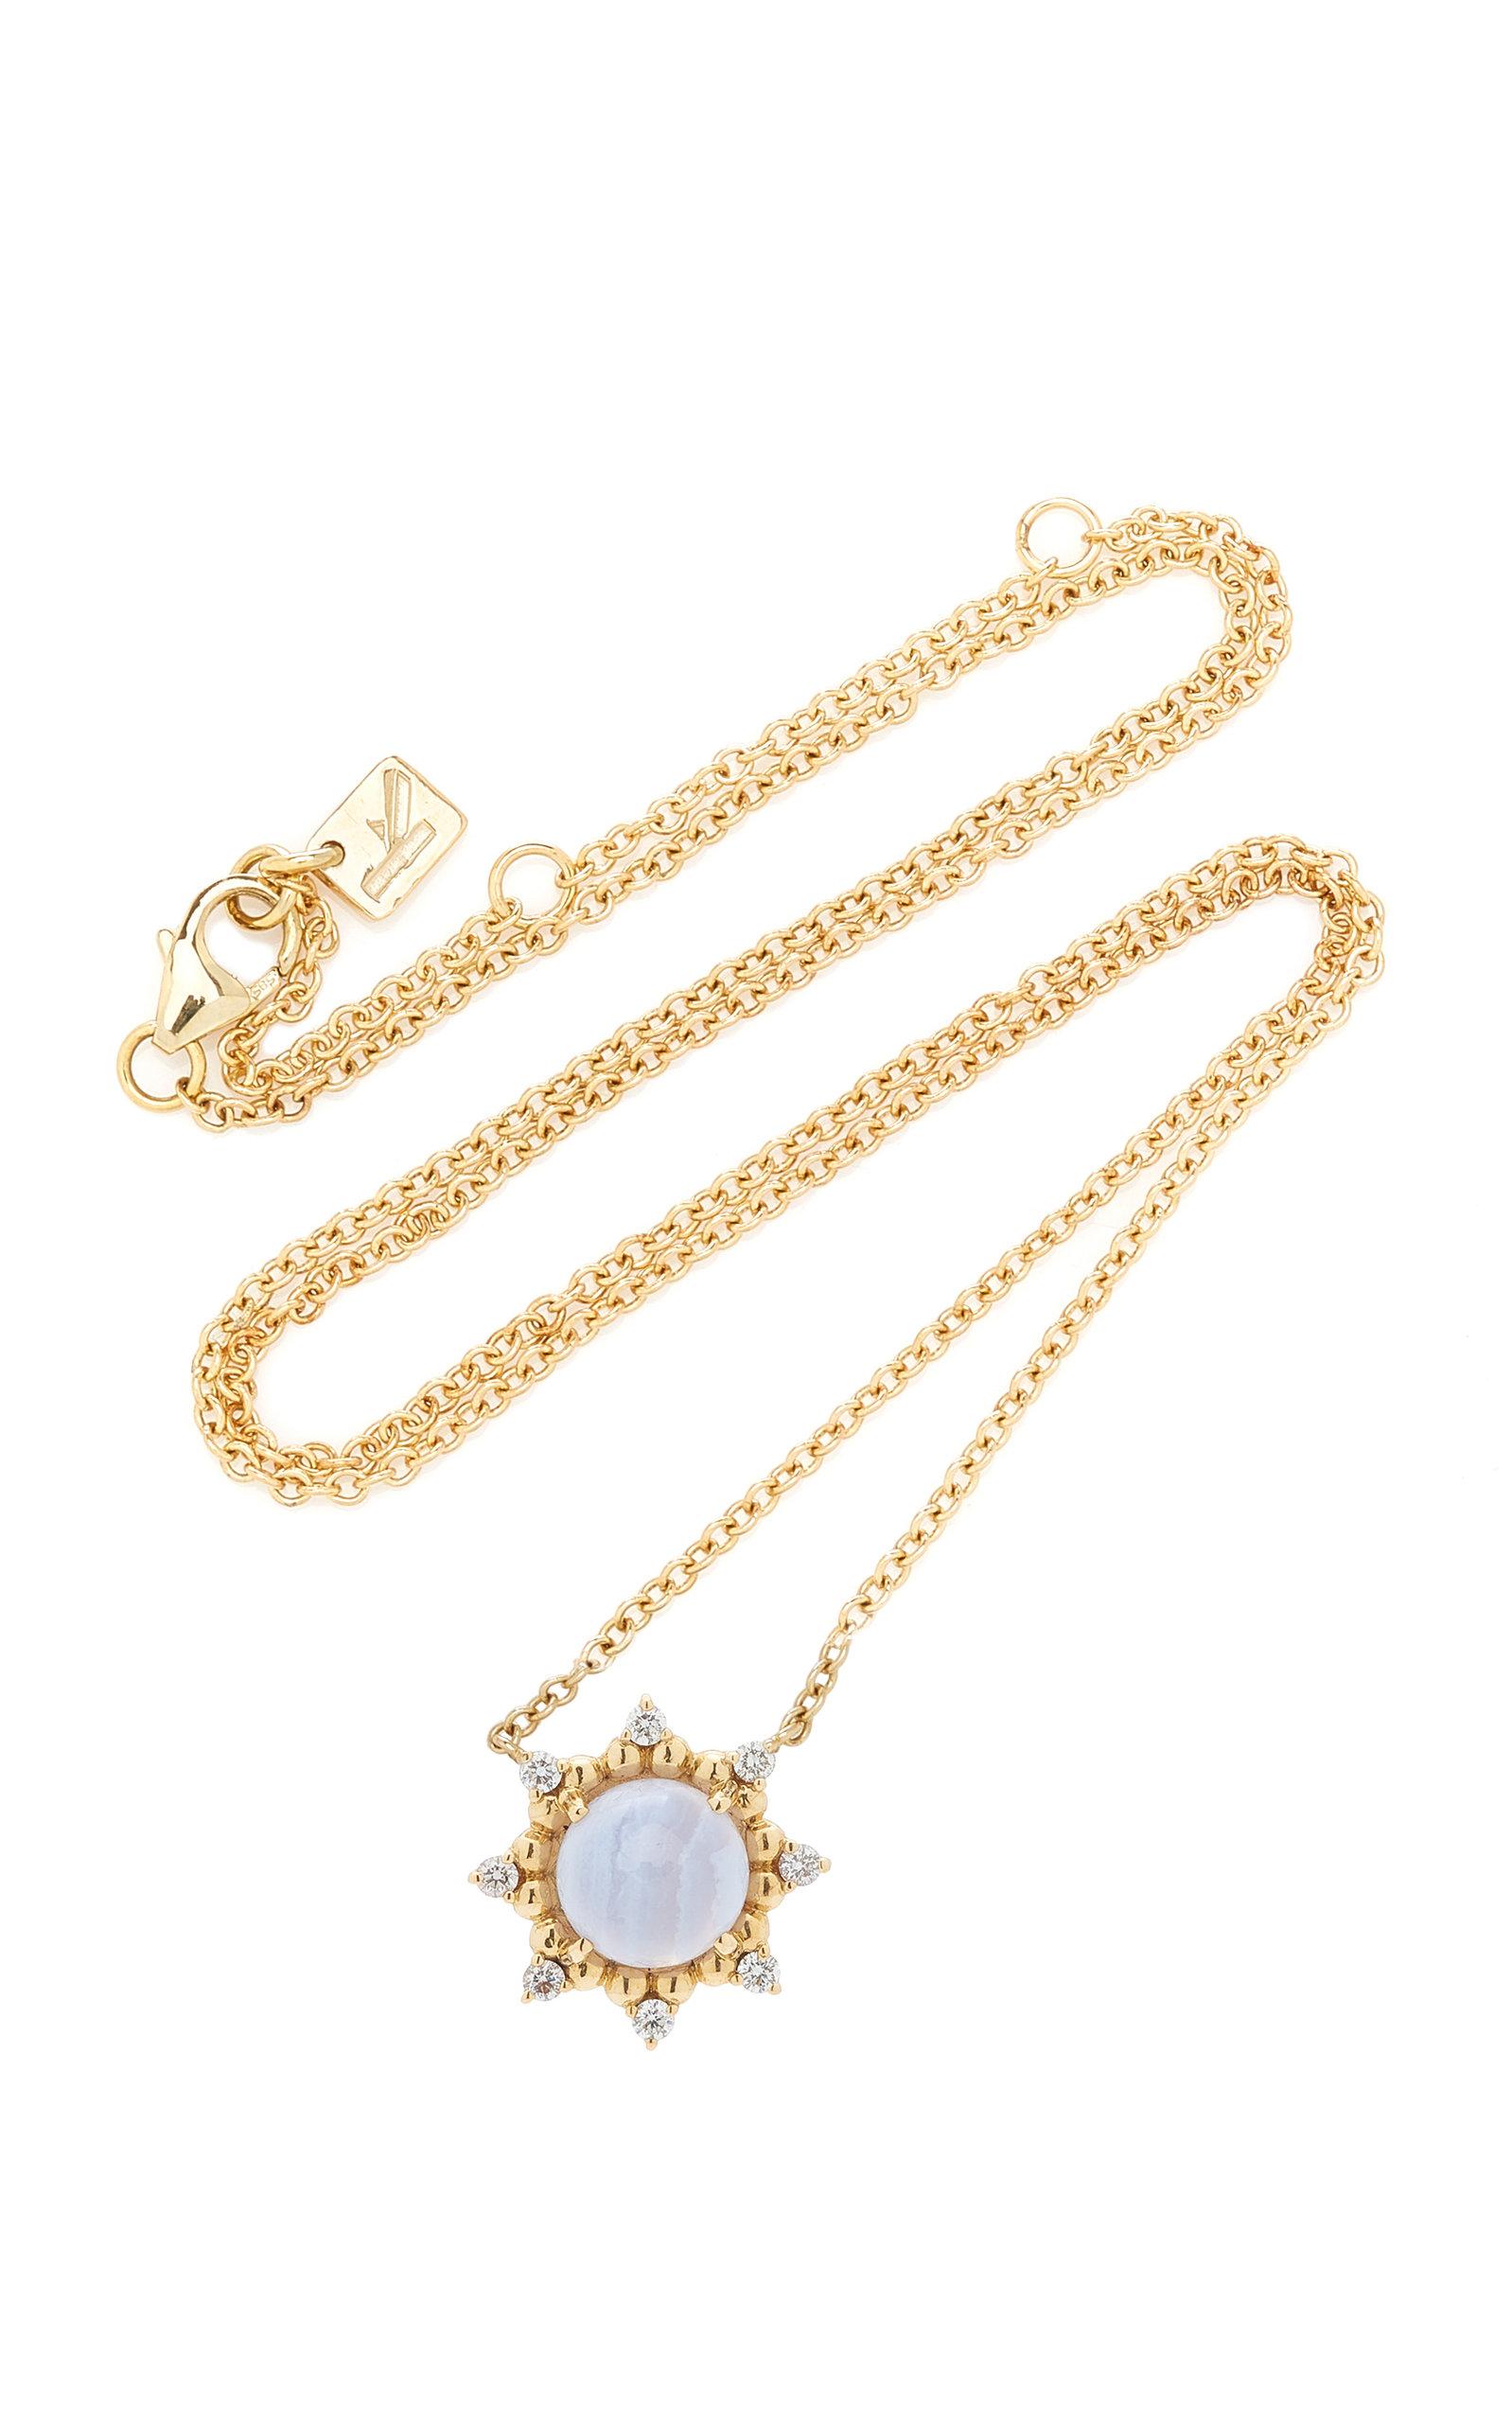 Women's Sunburst 14K Yellow Gold Agate and Diamond Necklace